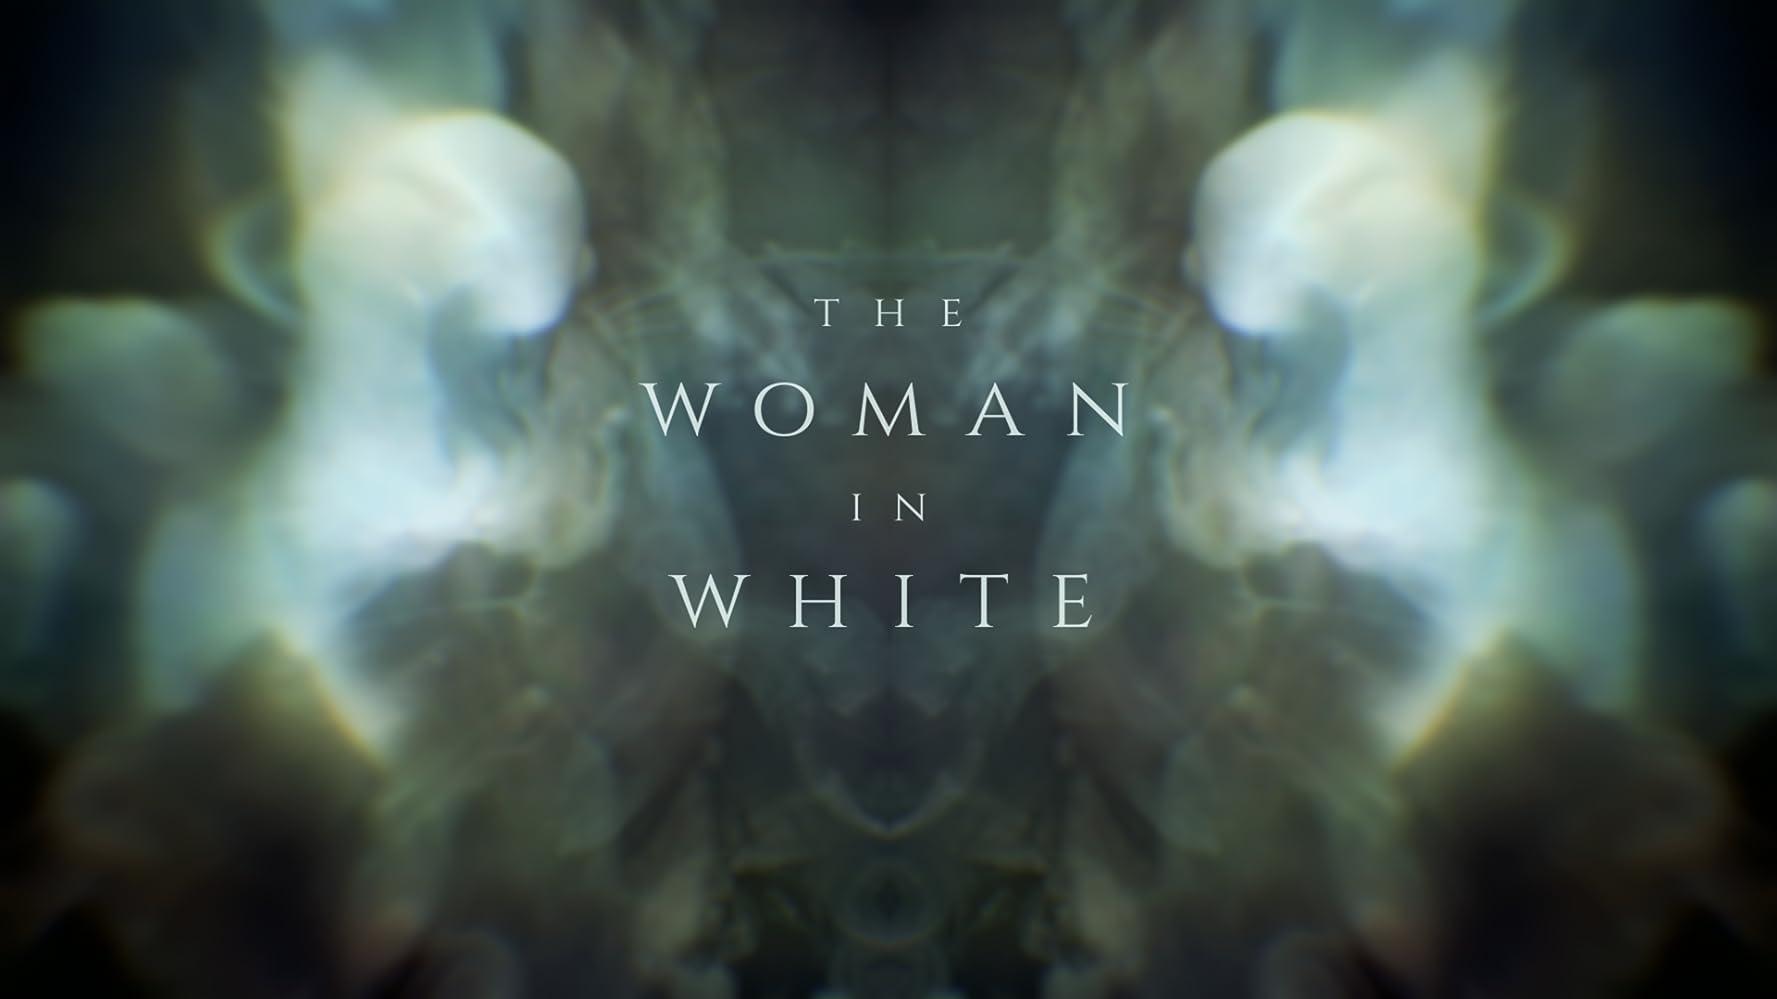 The Woman in White Temporada 1 Ingles Subtitulado 720p